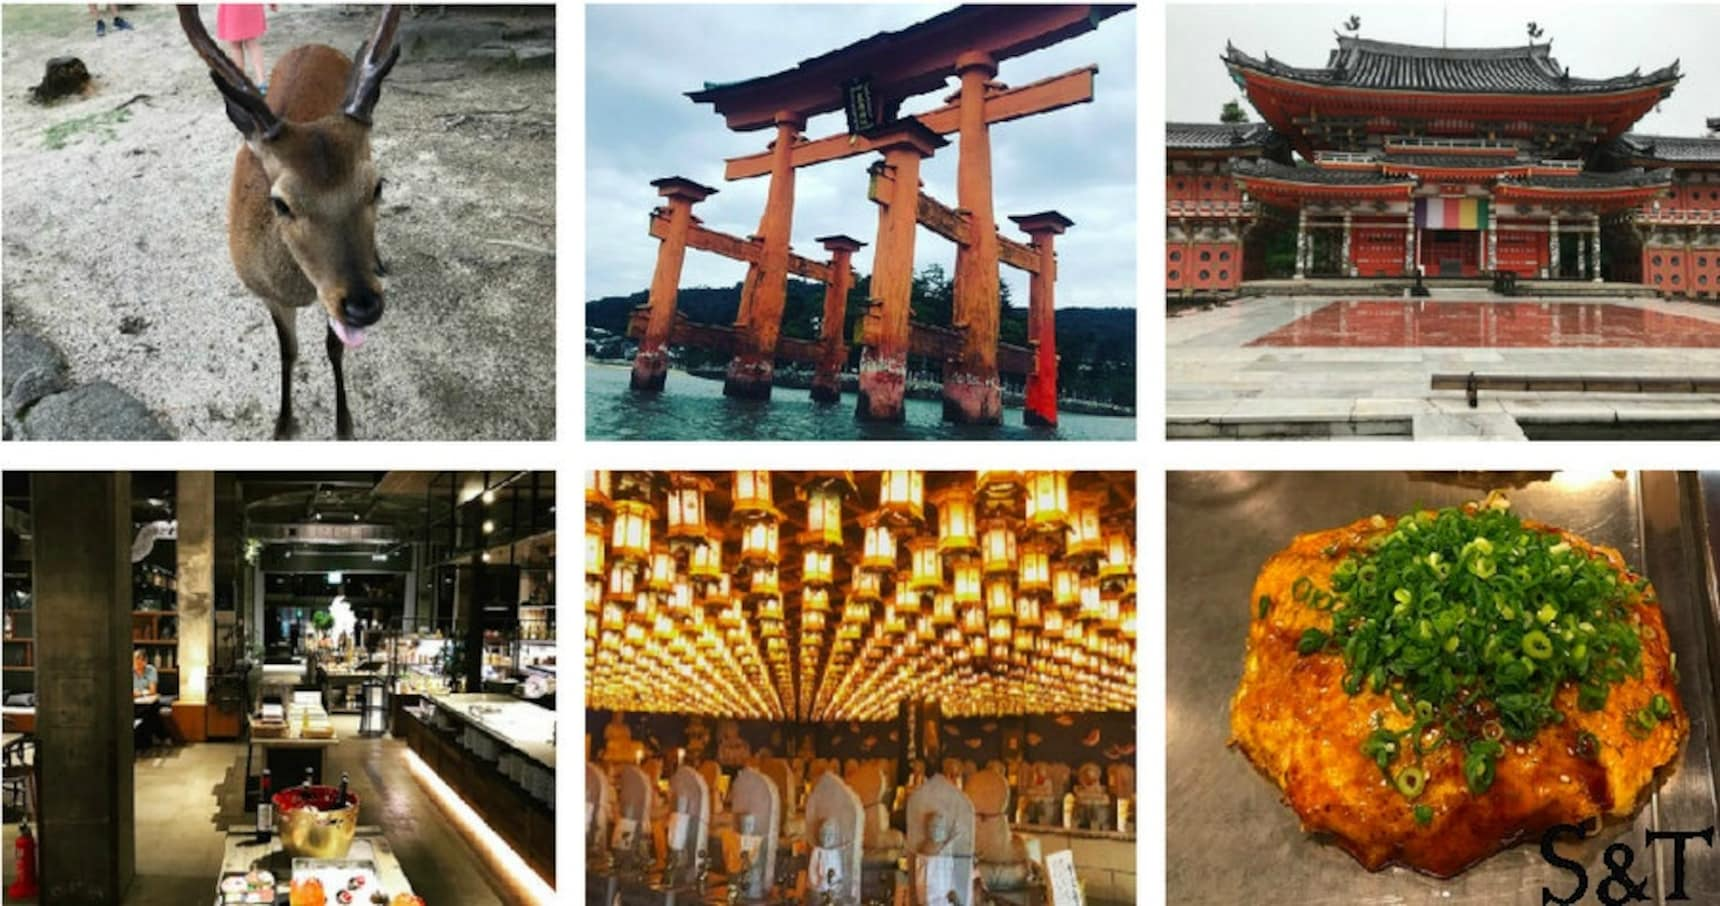 Spoon & Tamago Tour Hiroshima